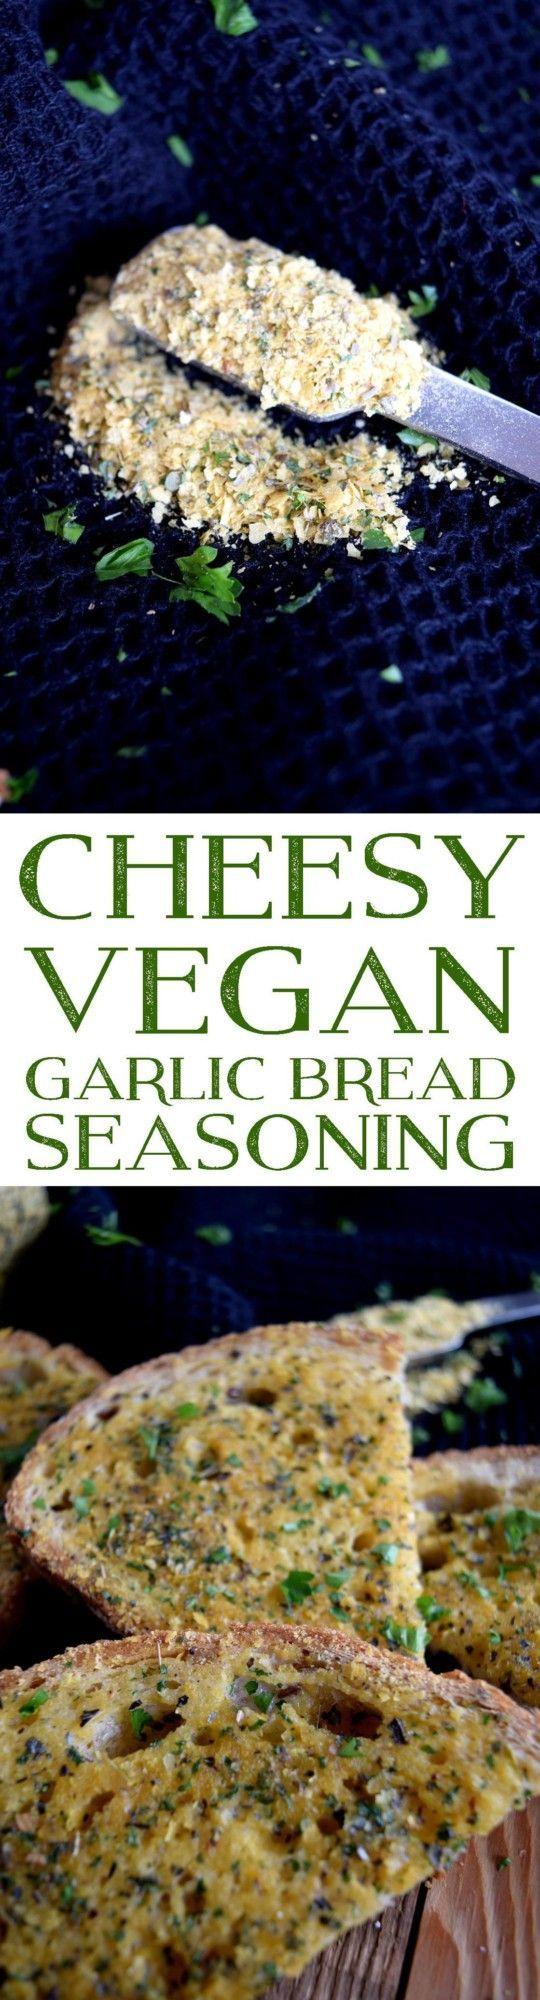 Cheesy Vegan Garlic Bread Seasoning - Lord Byron's Kitchen